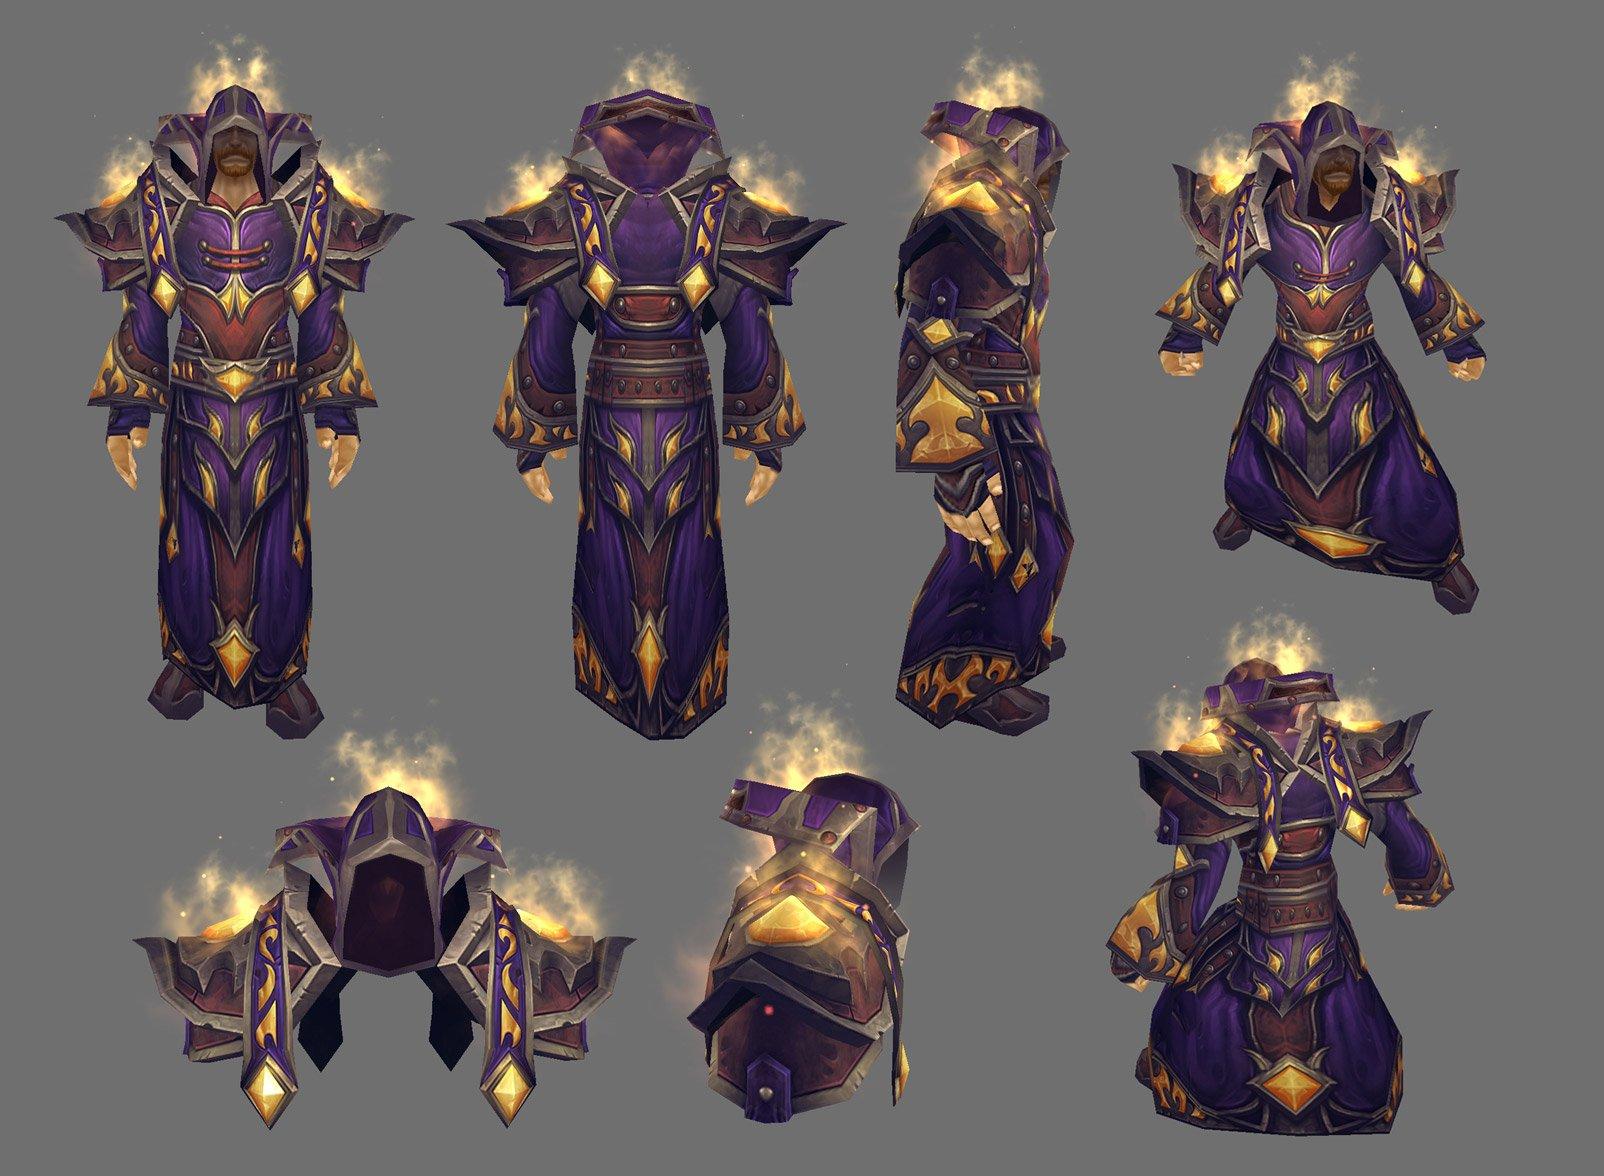 Tier 10 paladin and priest season 8 paladin armor publicscrutiny Gallery